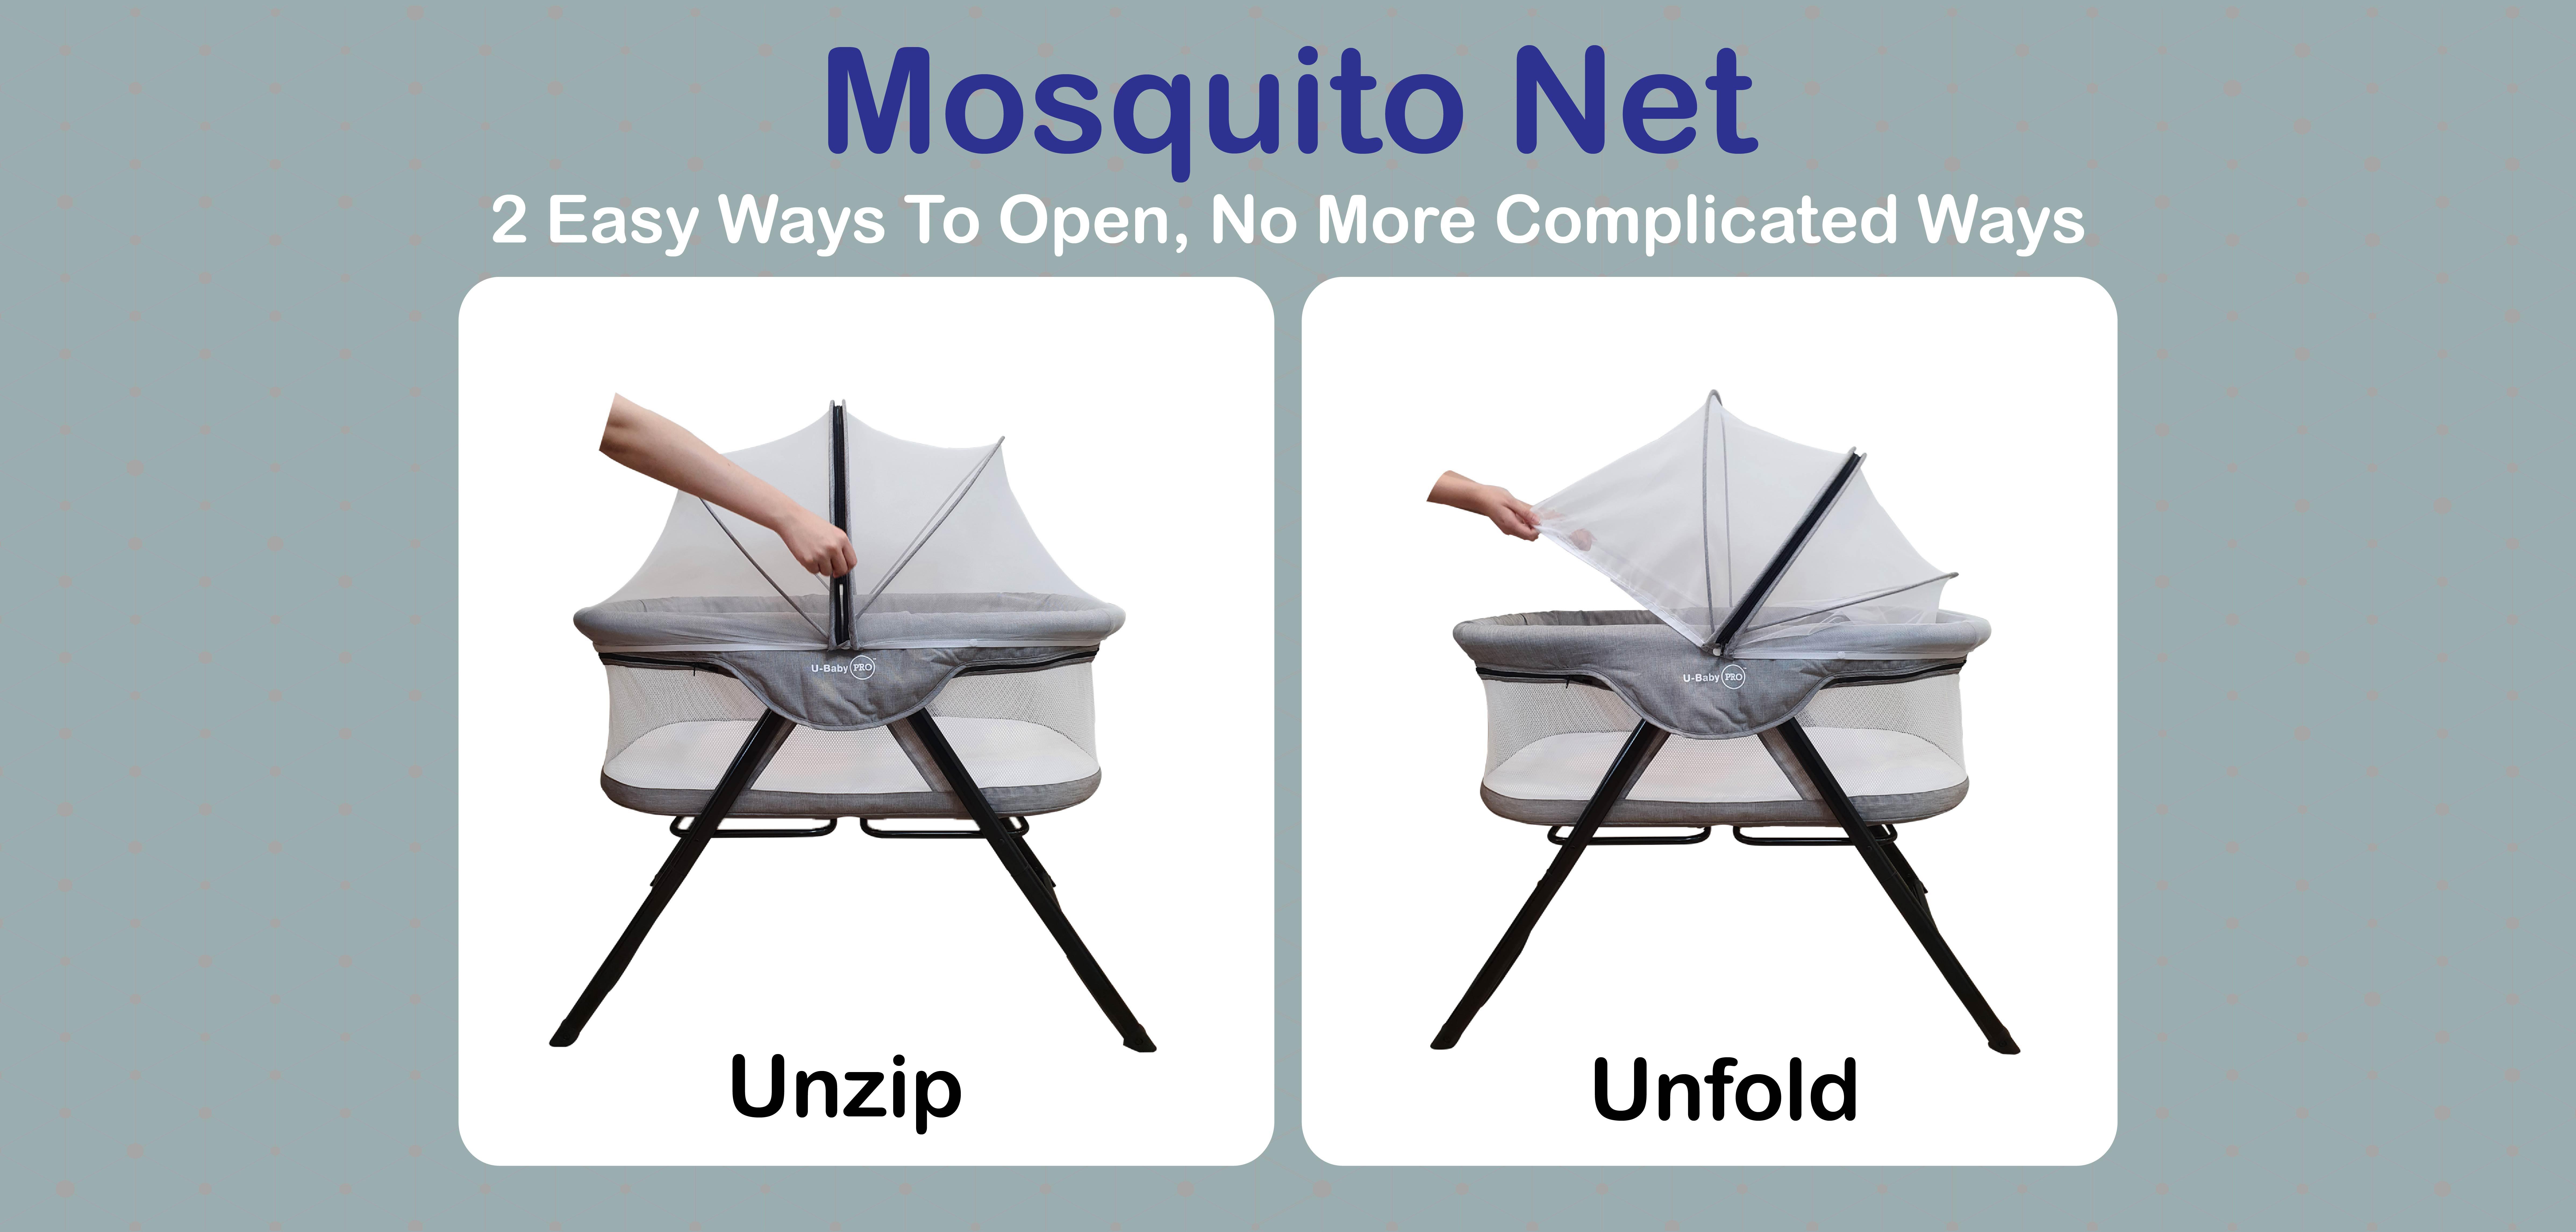 Mosquito net_landscape-01